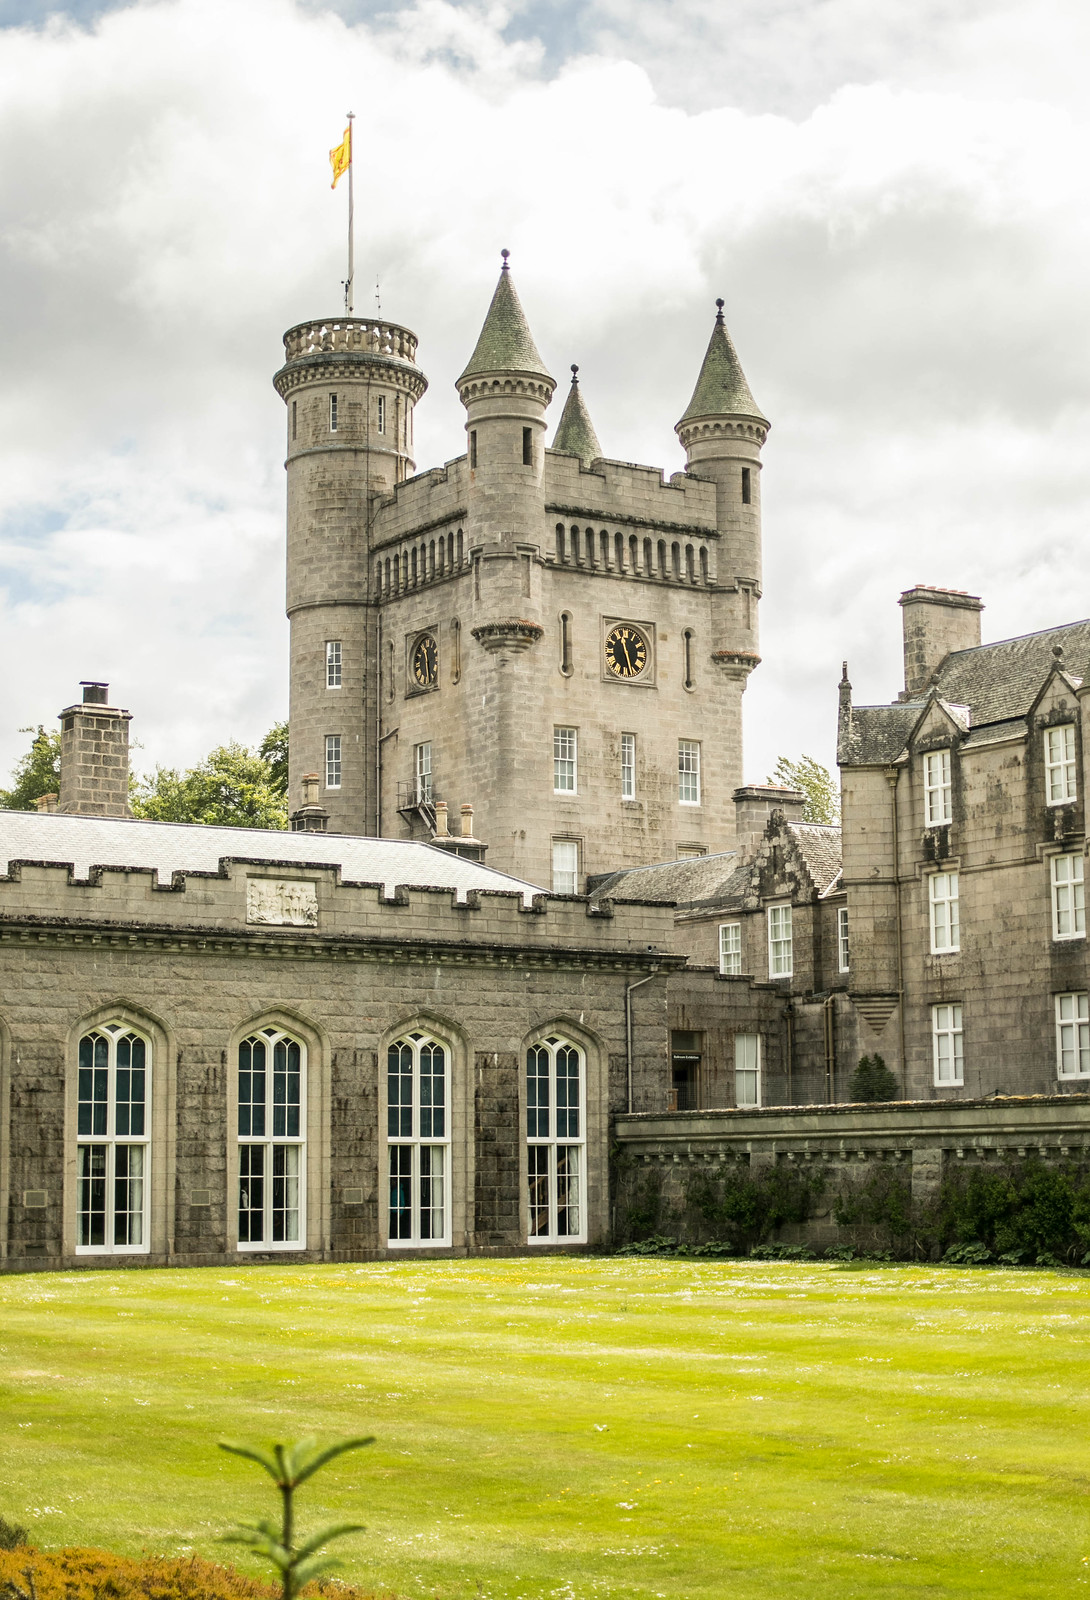 180614 - Balmoral Castle